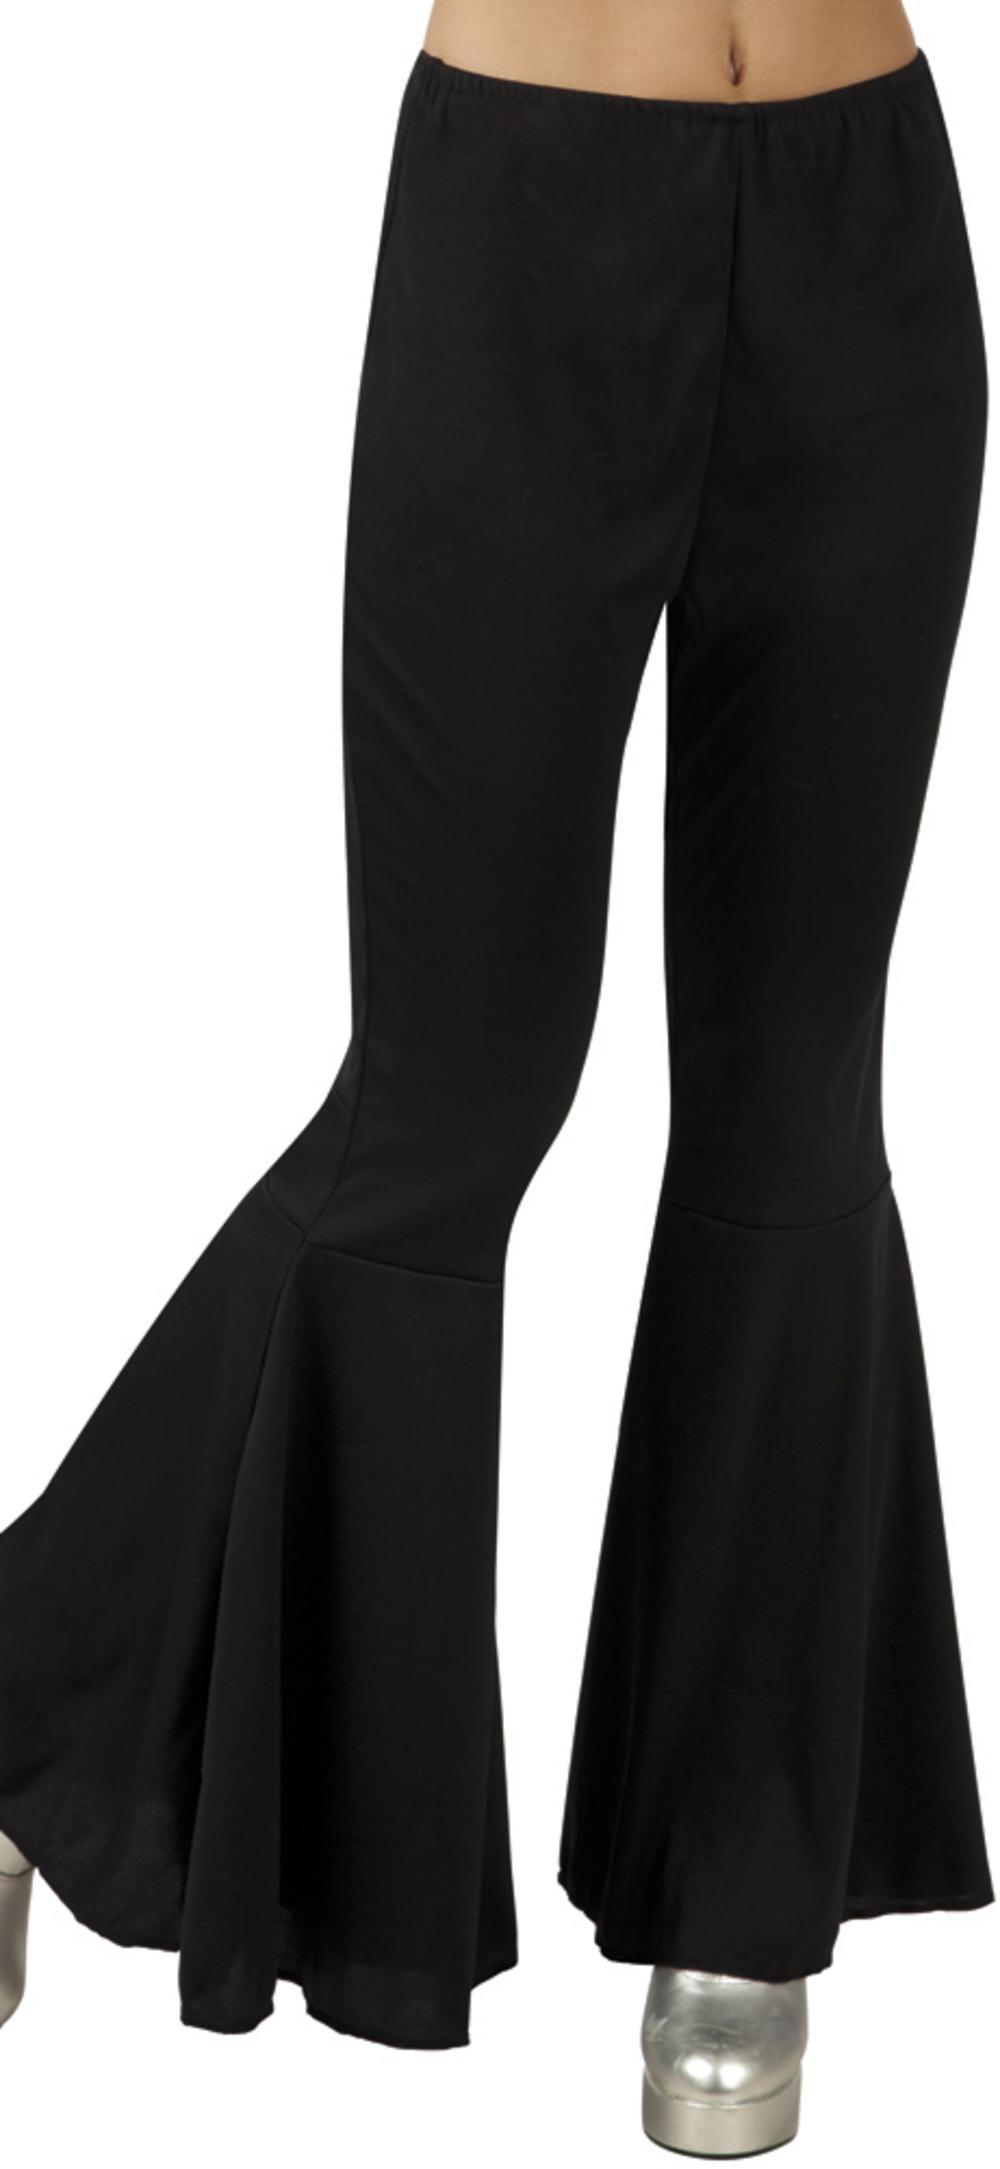 Black Flared Ladies Trousers